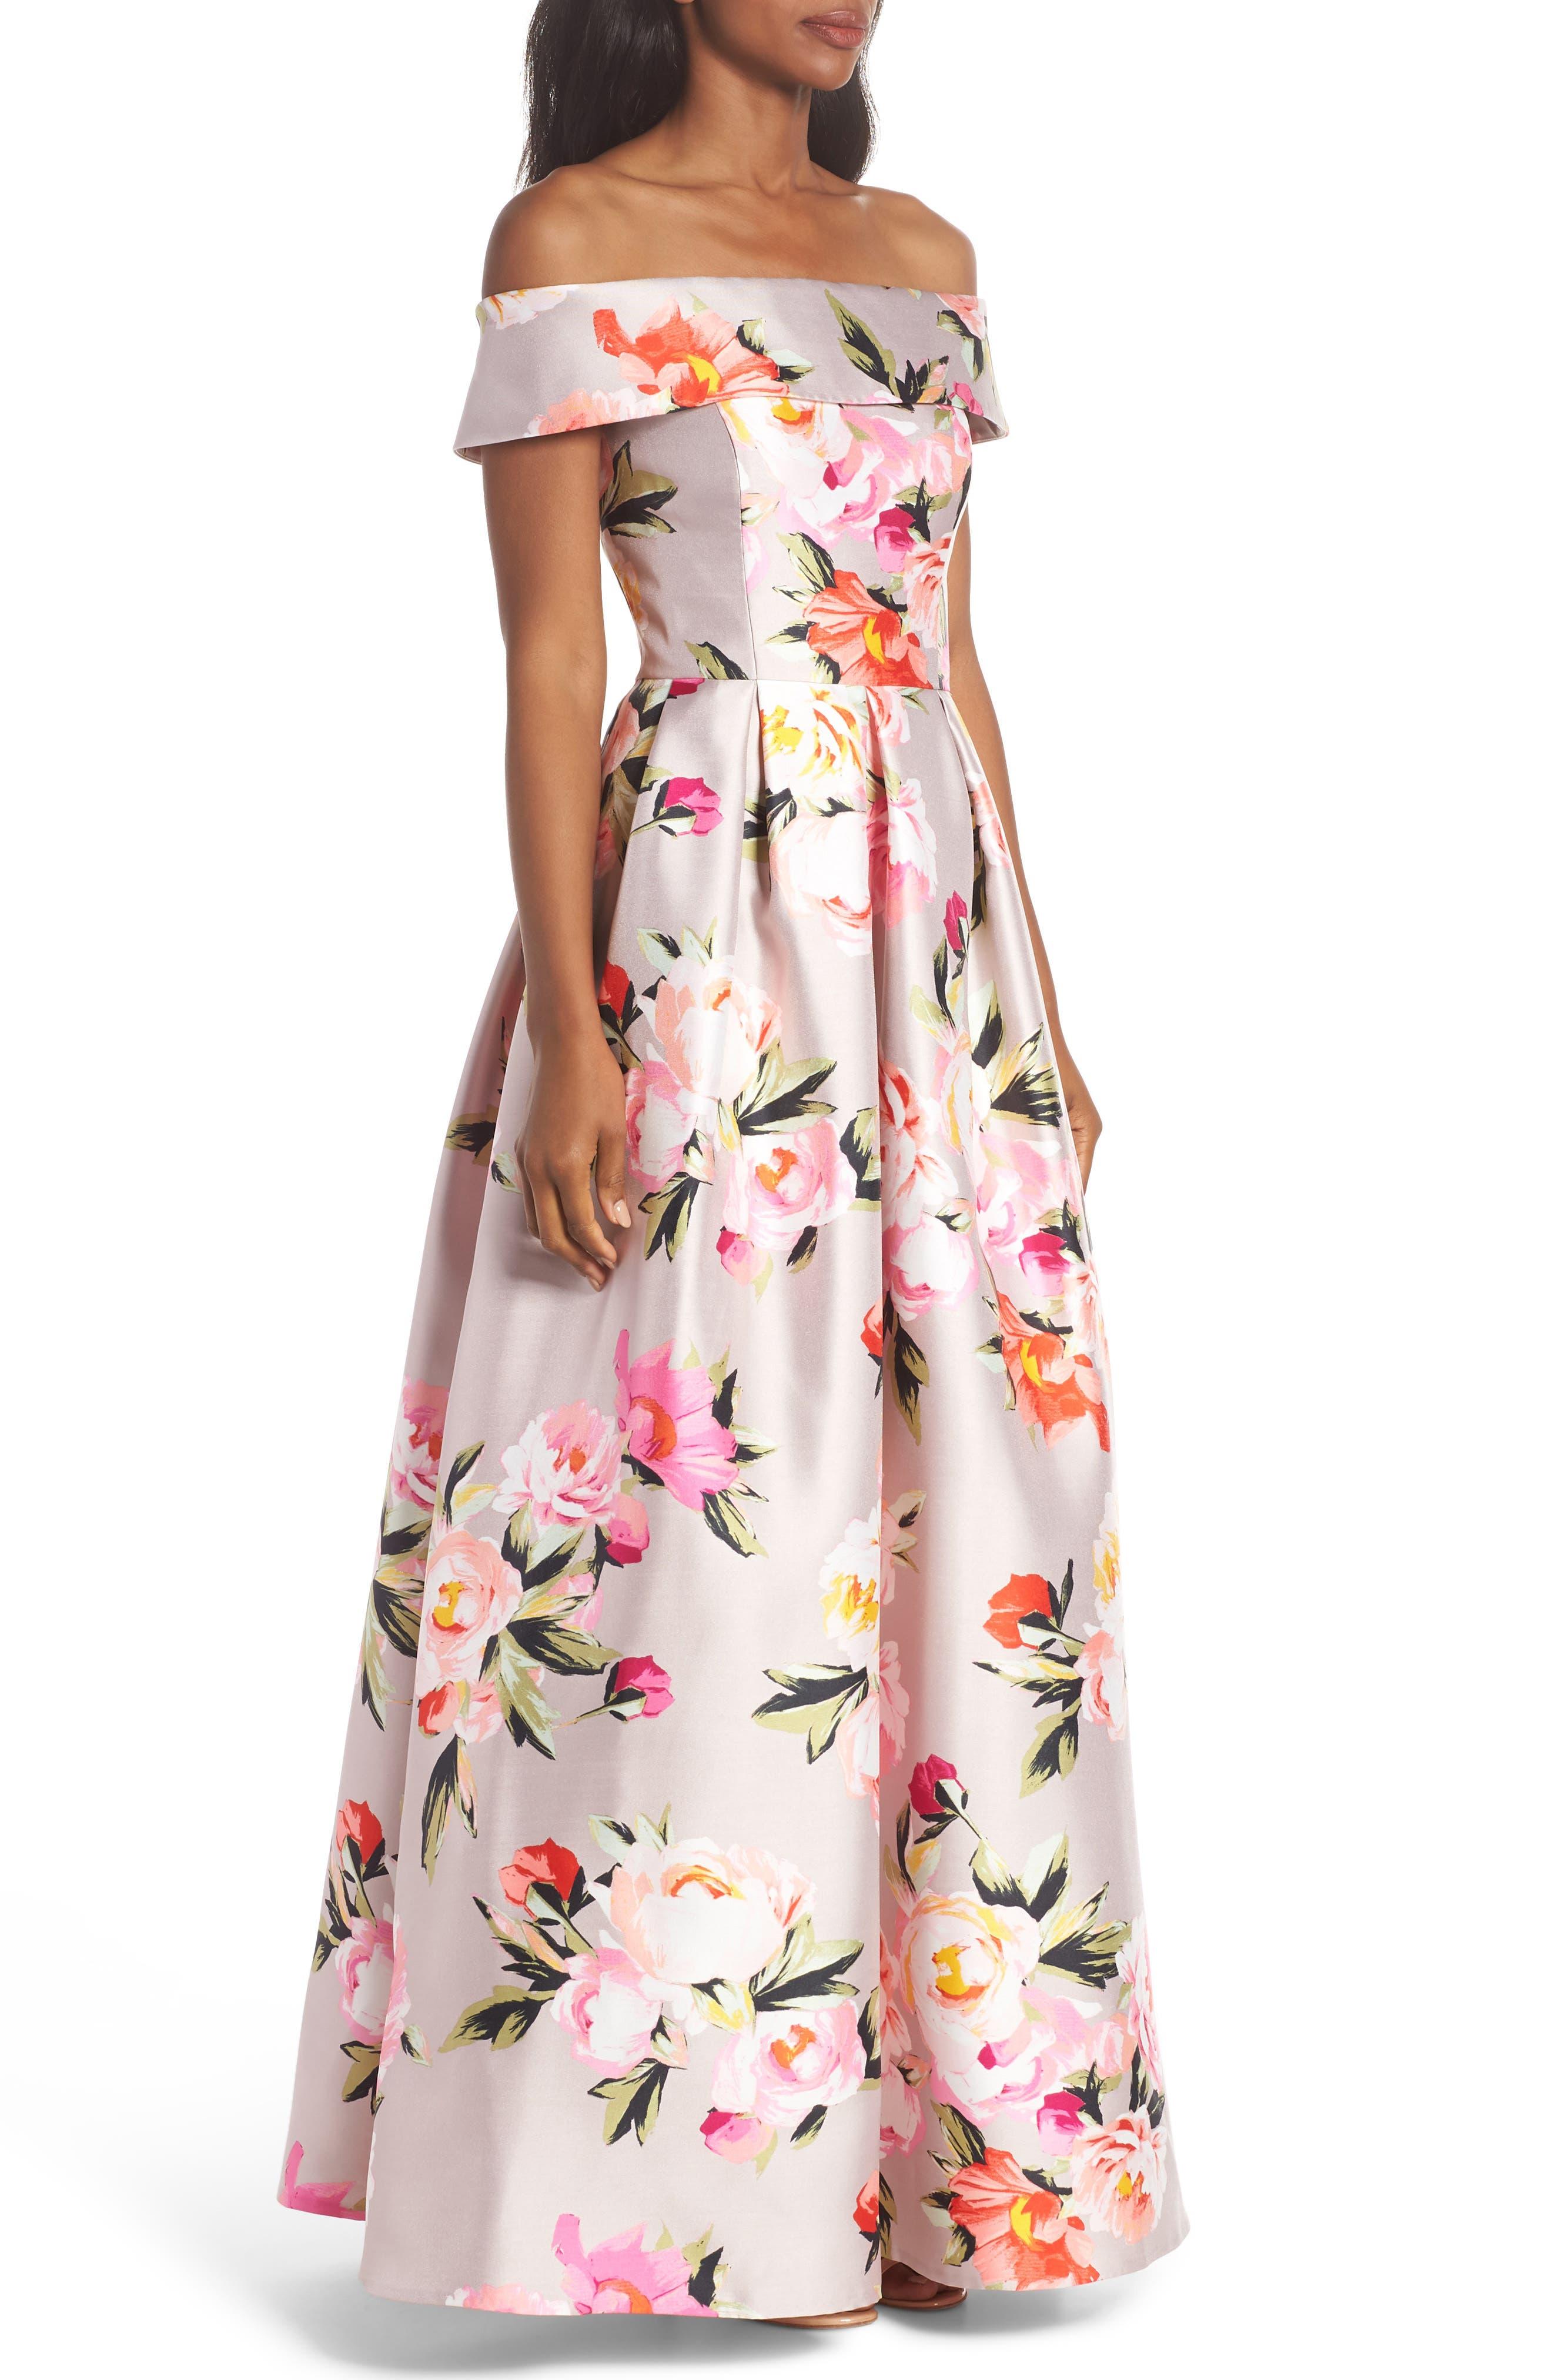 Floral Off the Shoulder Mikado Gown,                             Alternate thumbnail 4, color,                             254